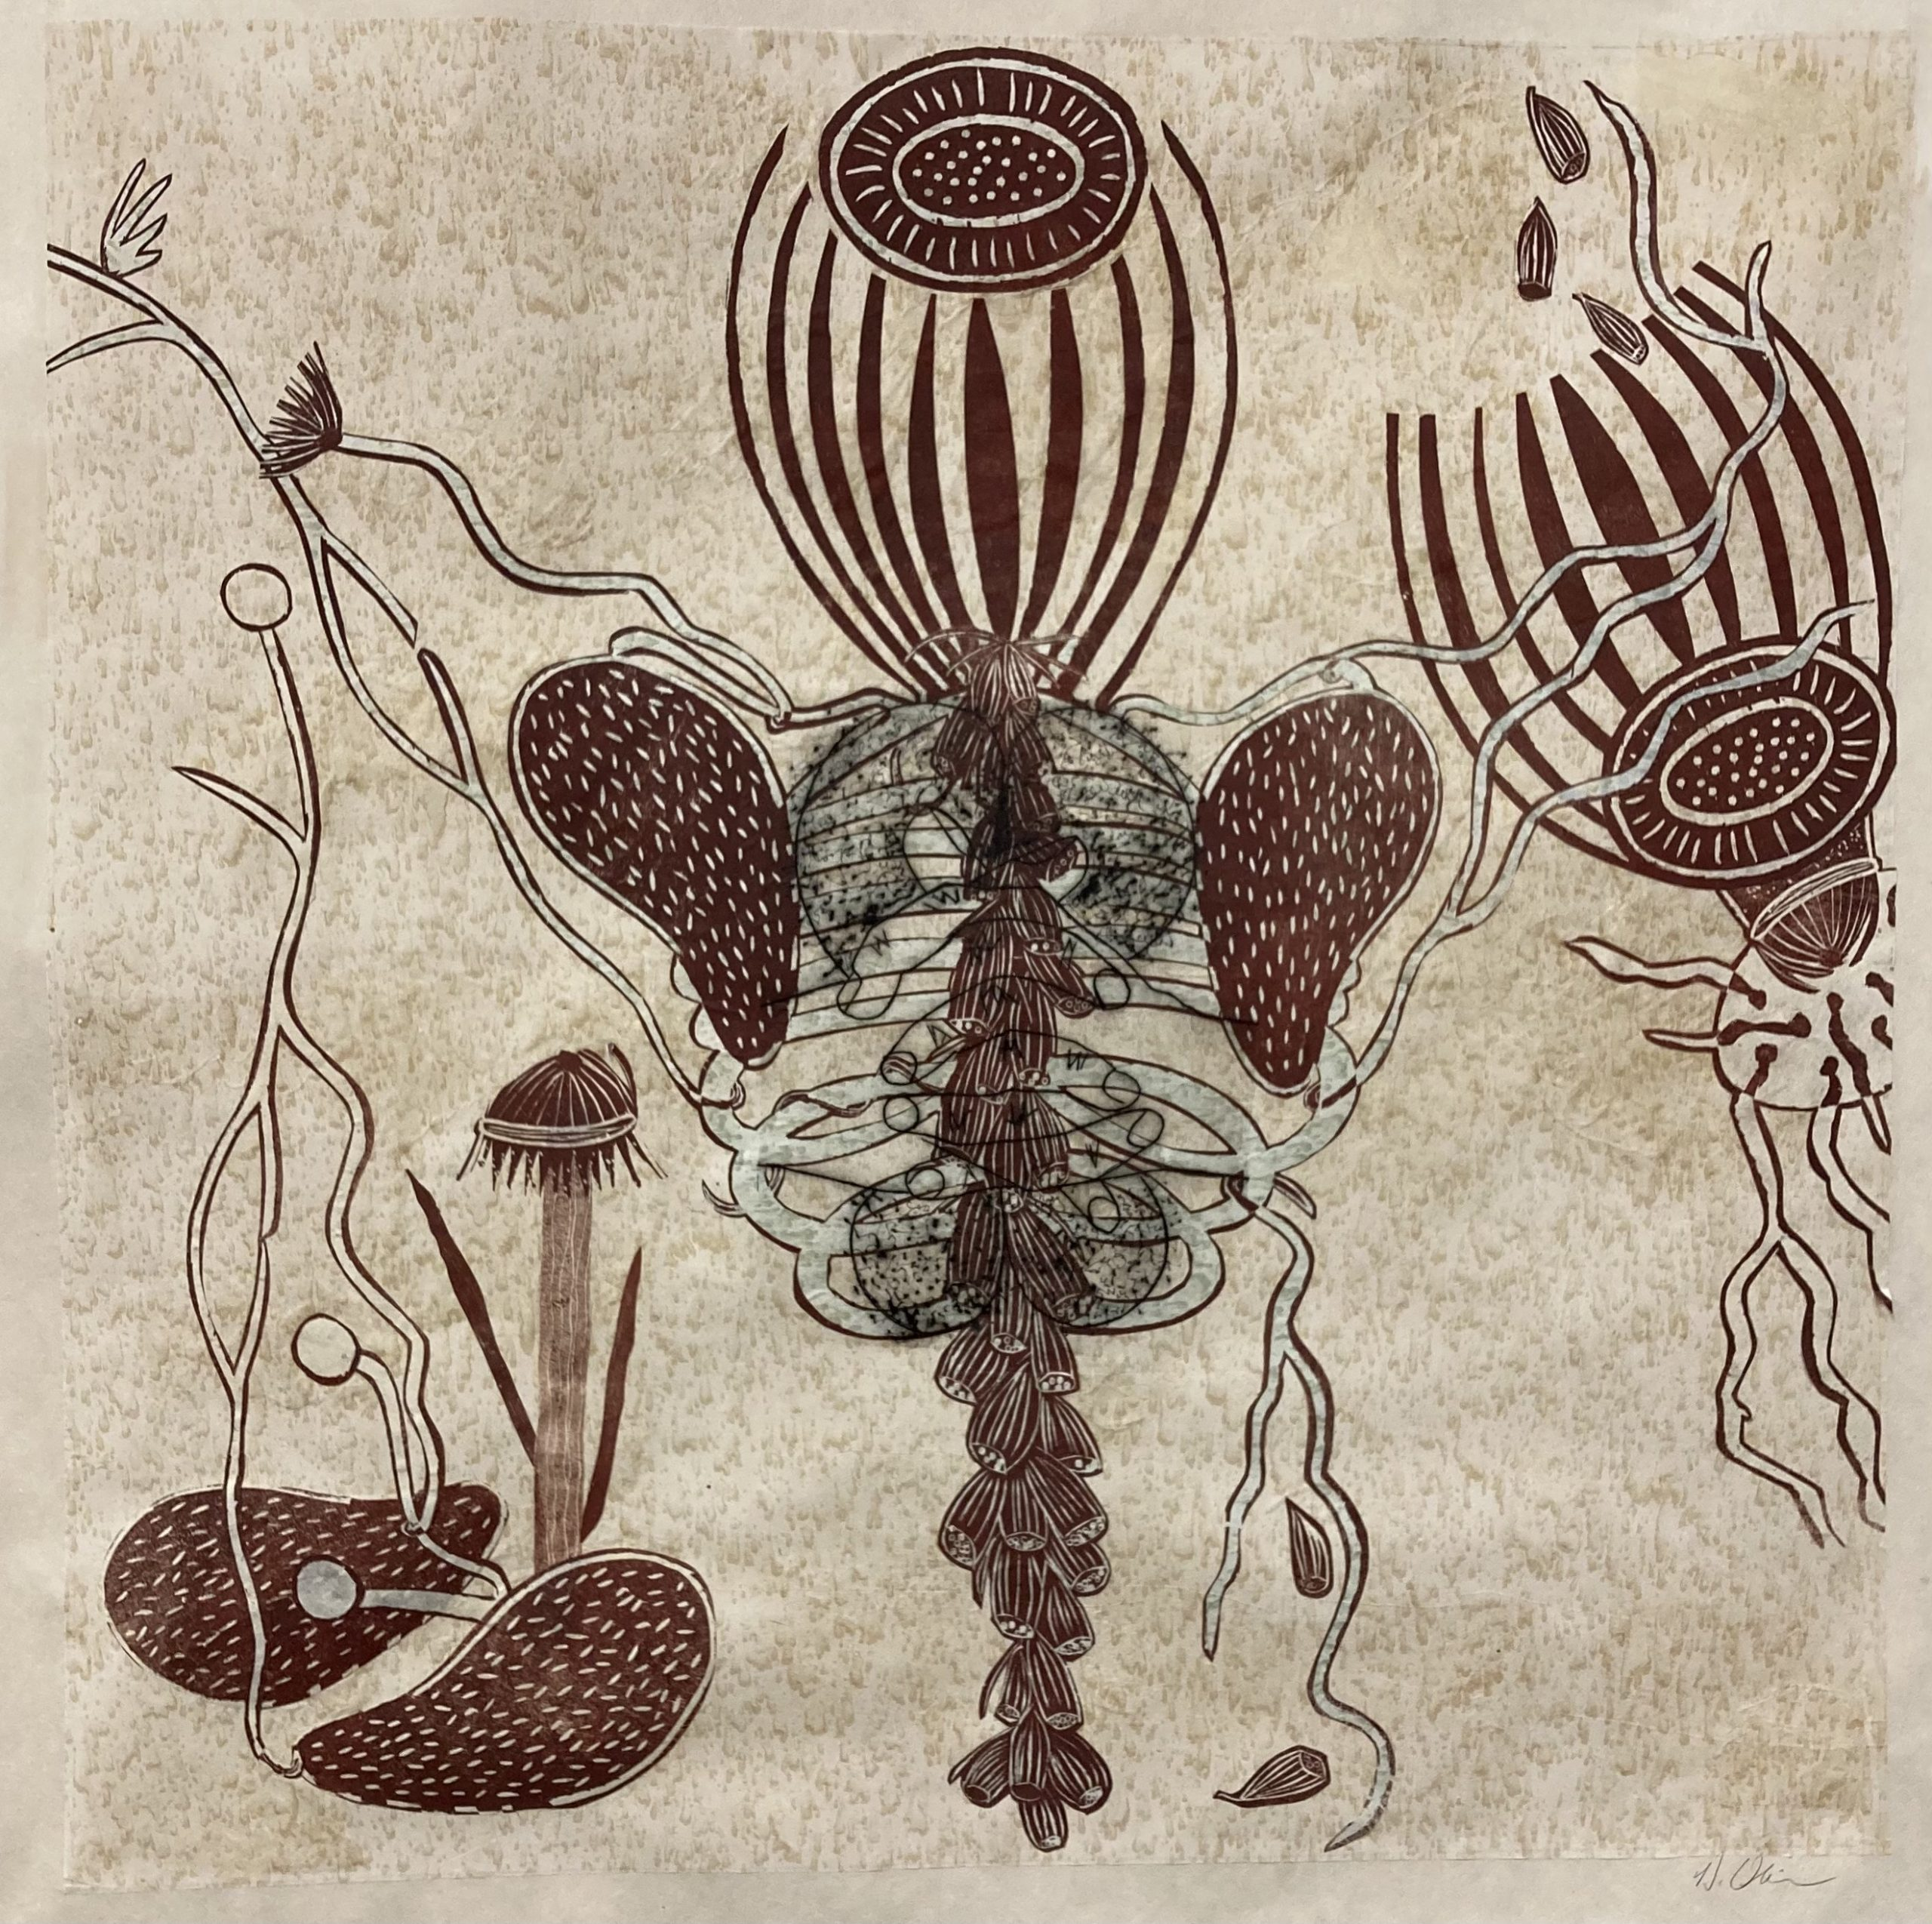 Debra Olin  -  Tight Squeeze  -  monoprint collage/woodcut  -  33 x 33  -  $900